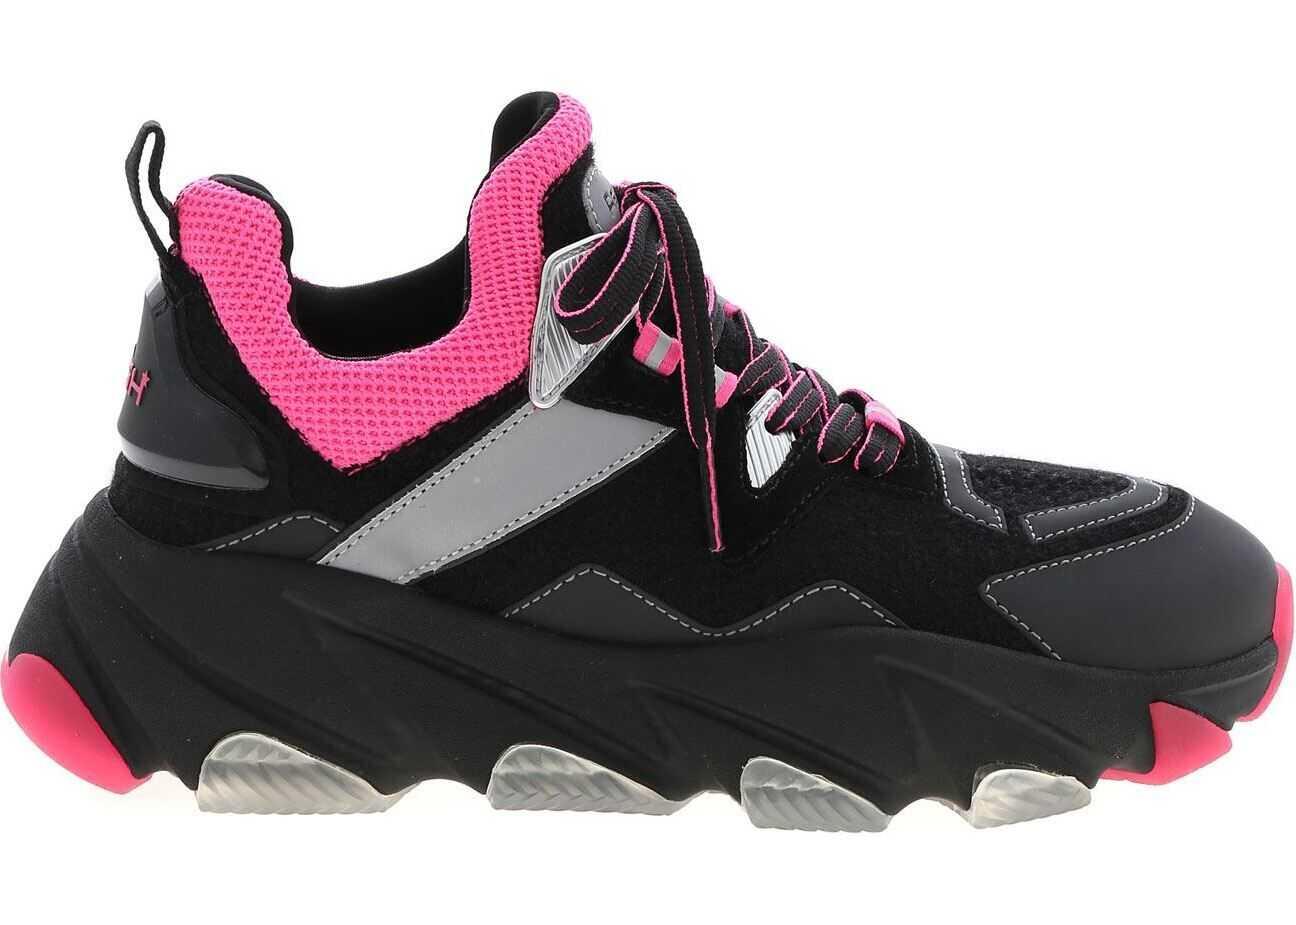 ASH Energy Sneakers In Black And Neon Pink Black